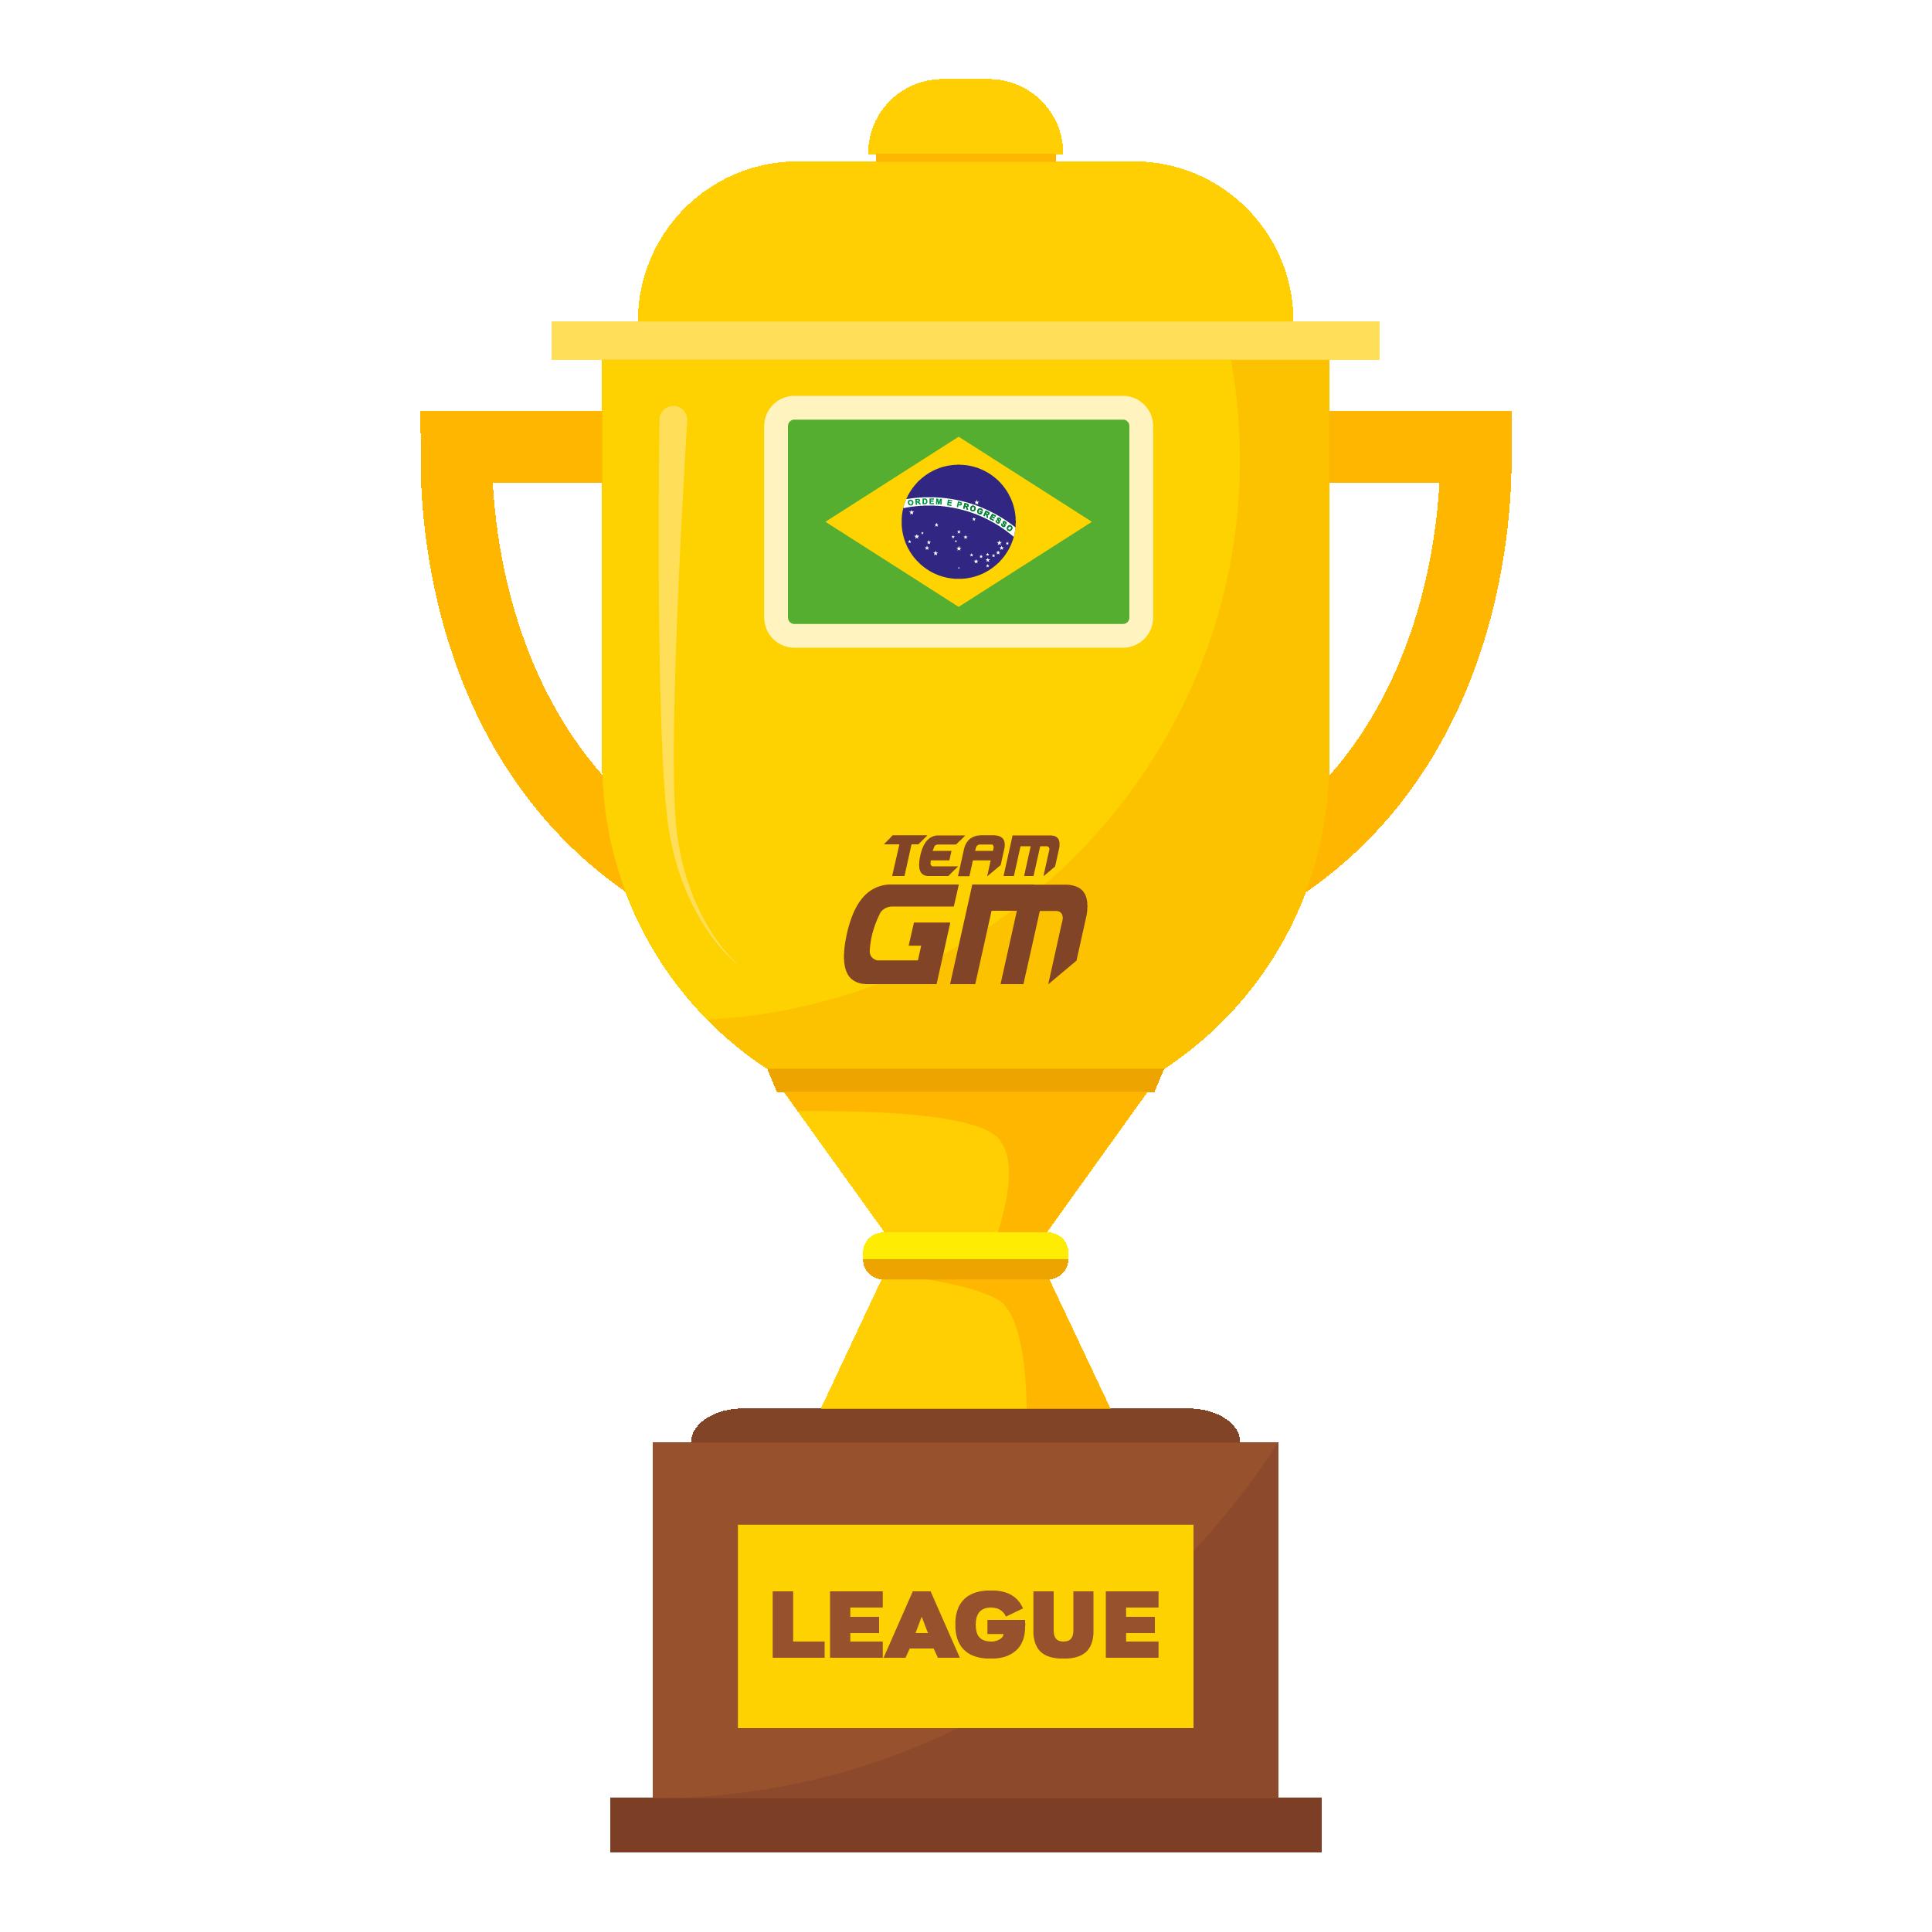 6TH - BRAZILIAN SUPERLEAGUE (B SERIE)